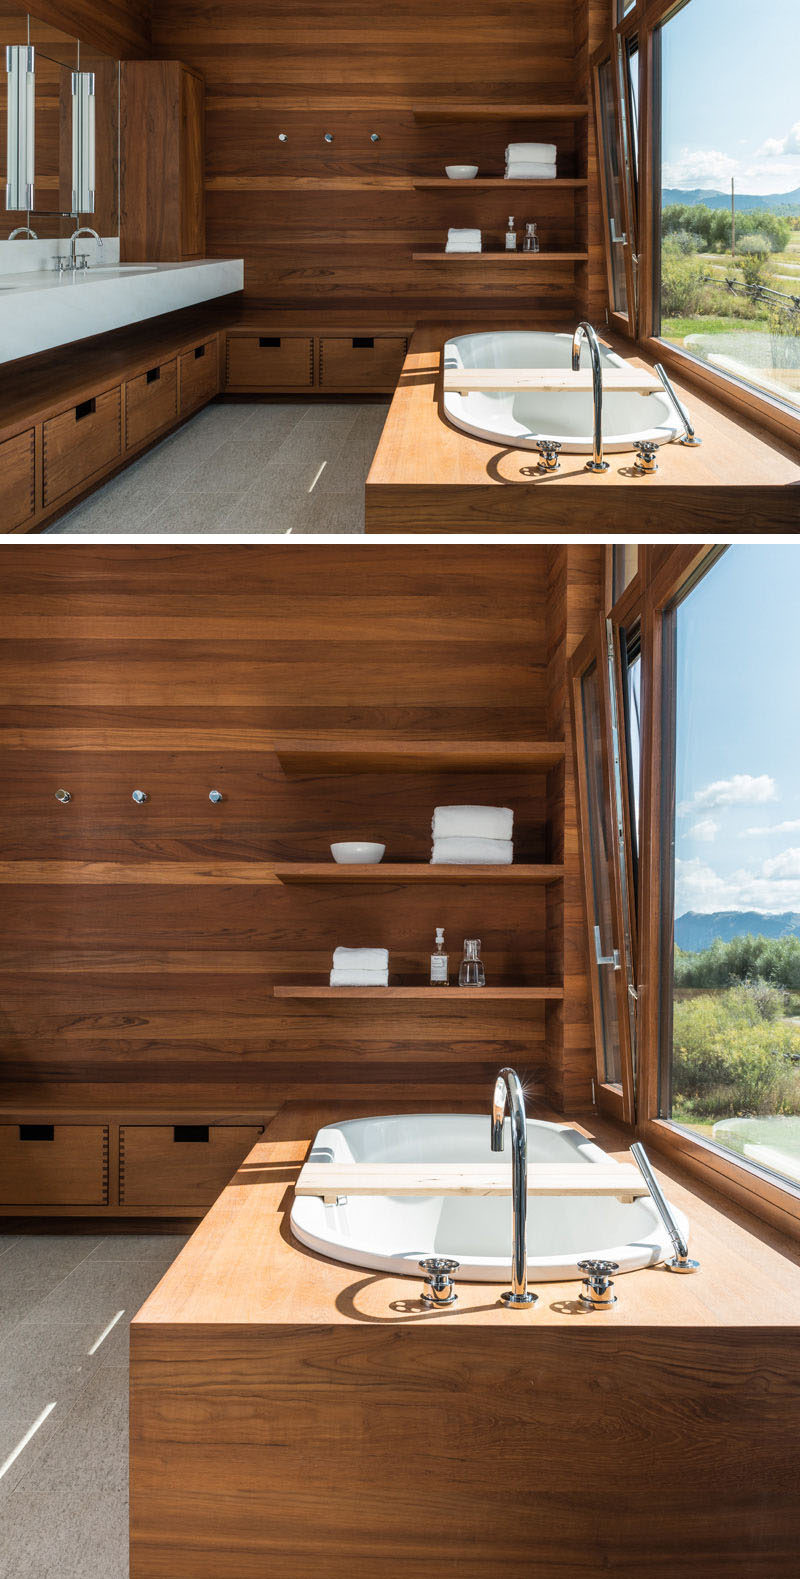 Bathroom Design Idea Create A Luxurious SpaLike Bathroom At - Spa like bathrooms